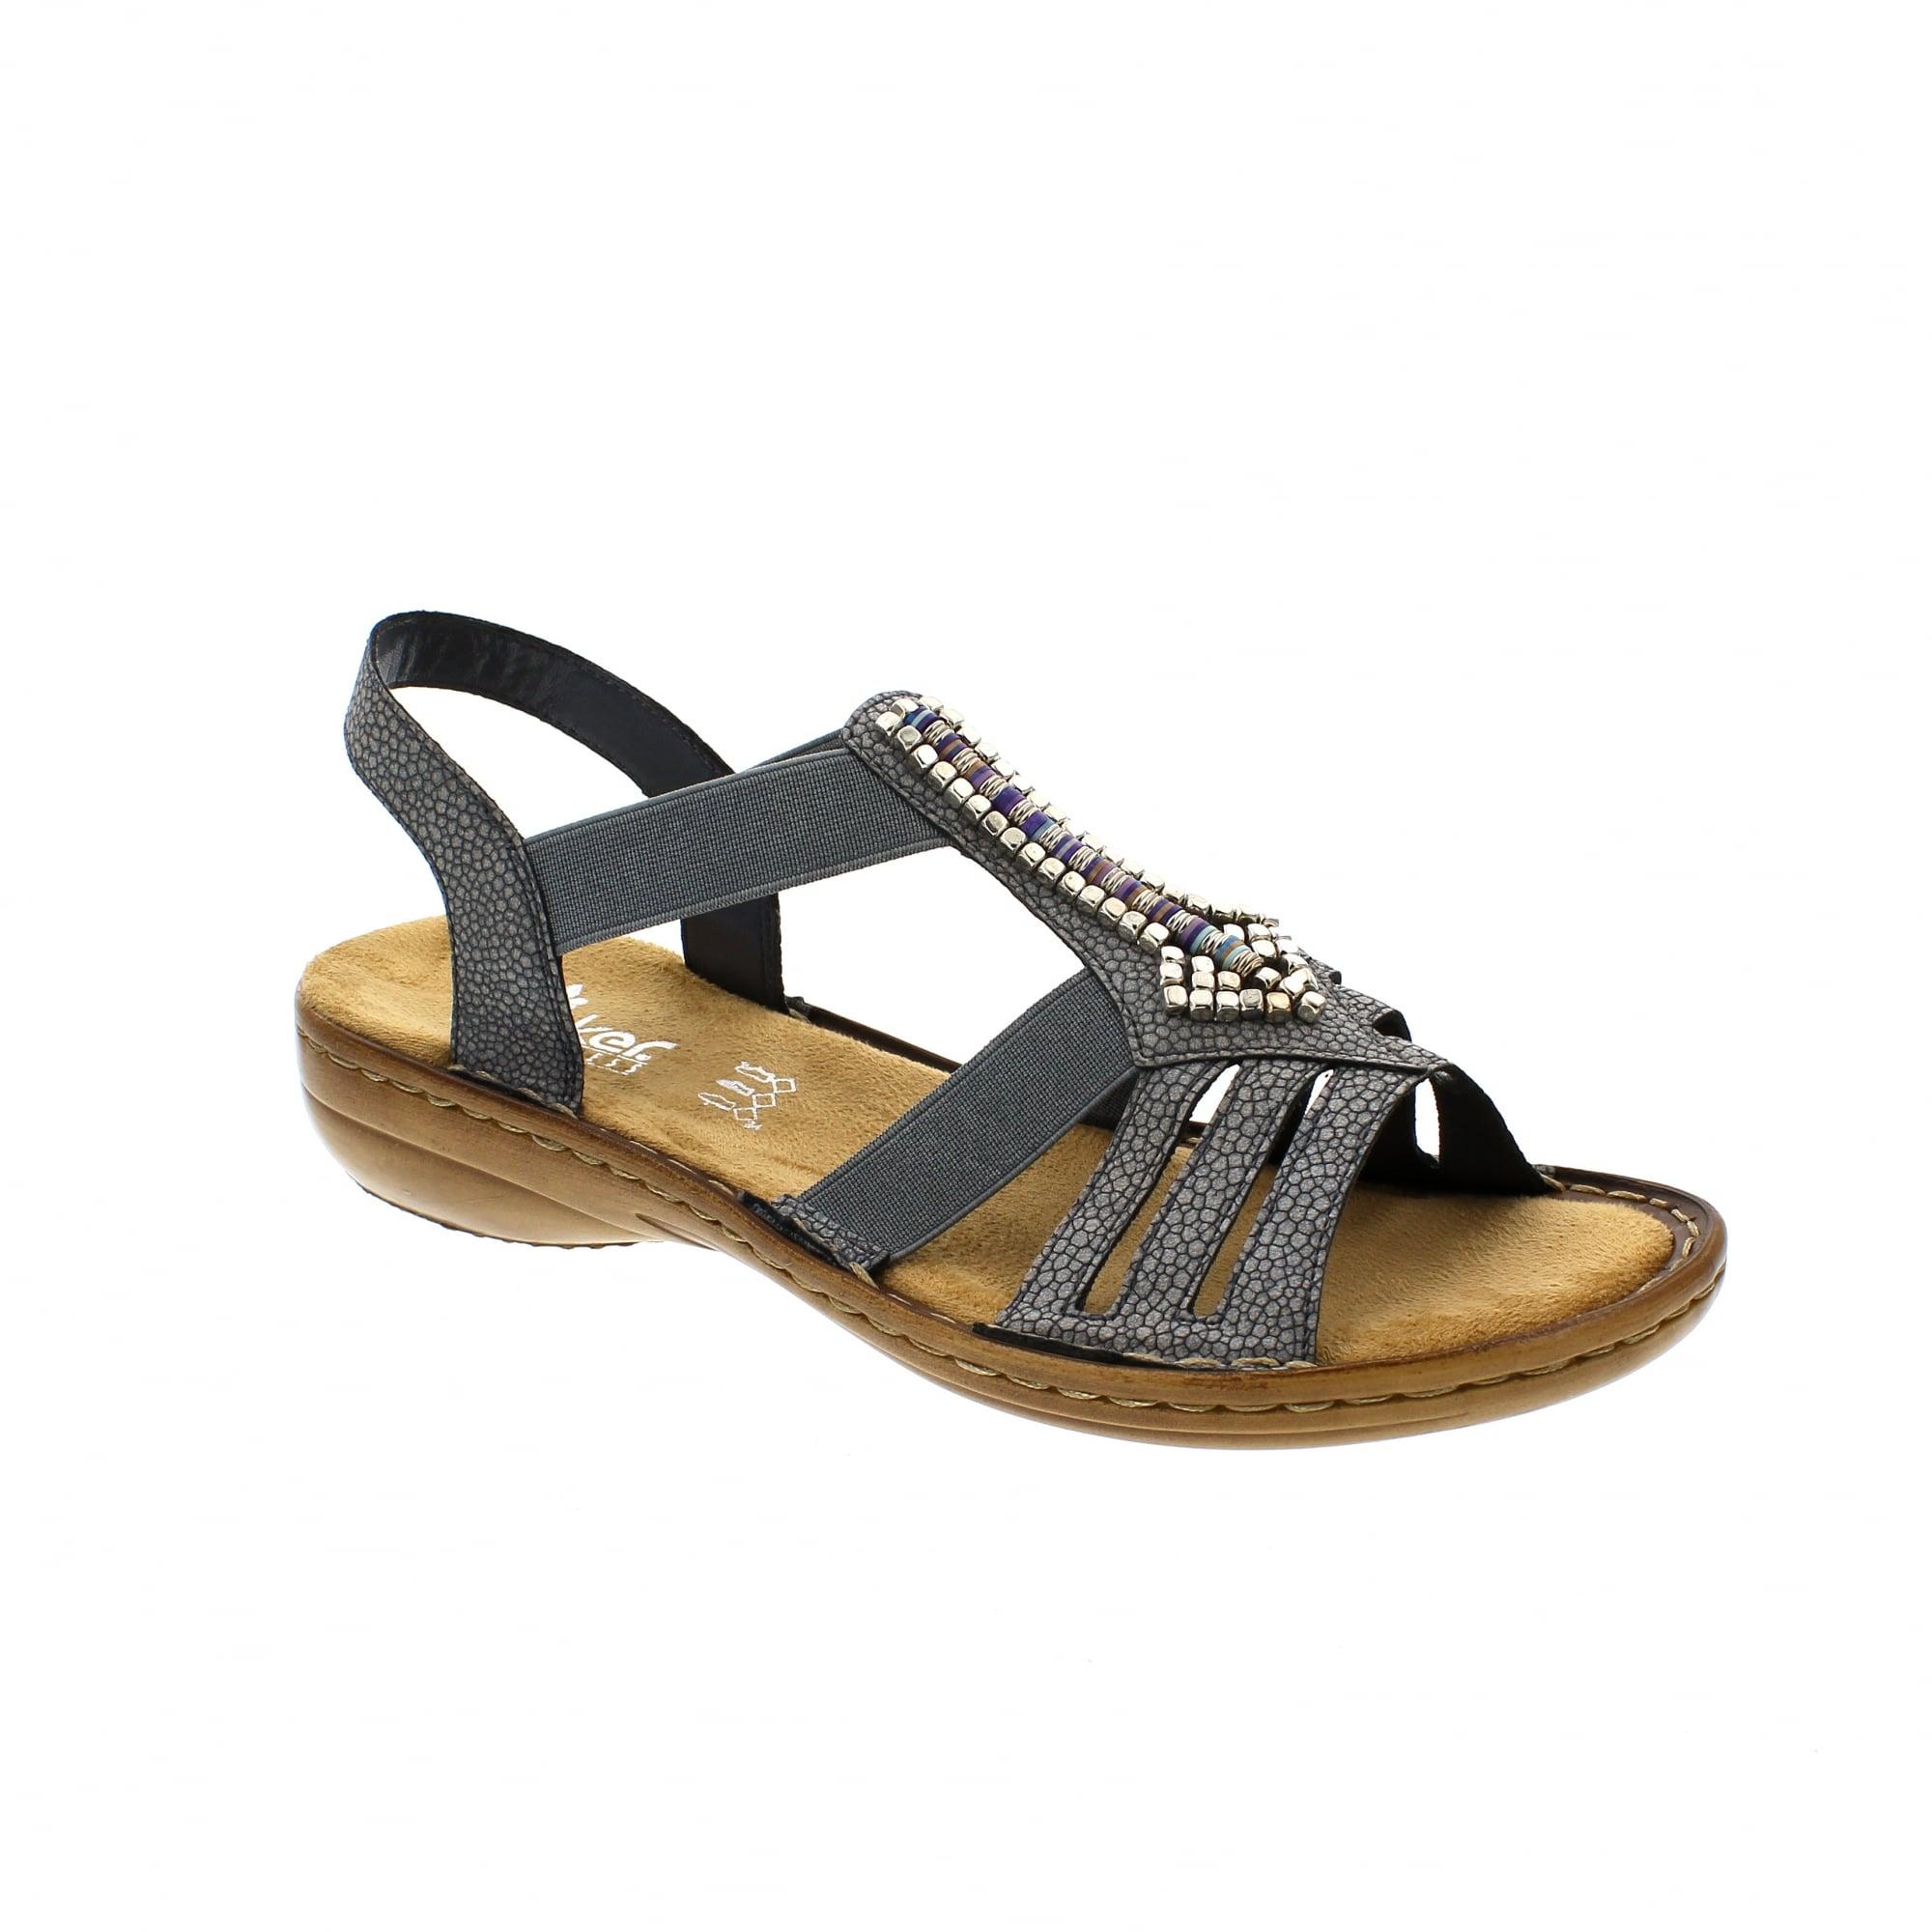 a9638ba3c65 Rieker 608S1-42 Grey Print Womens Sandals | Rogerson Shoes